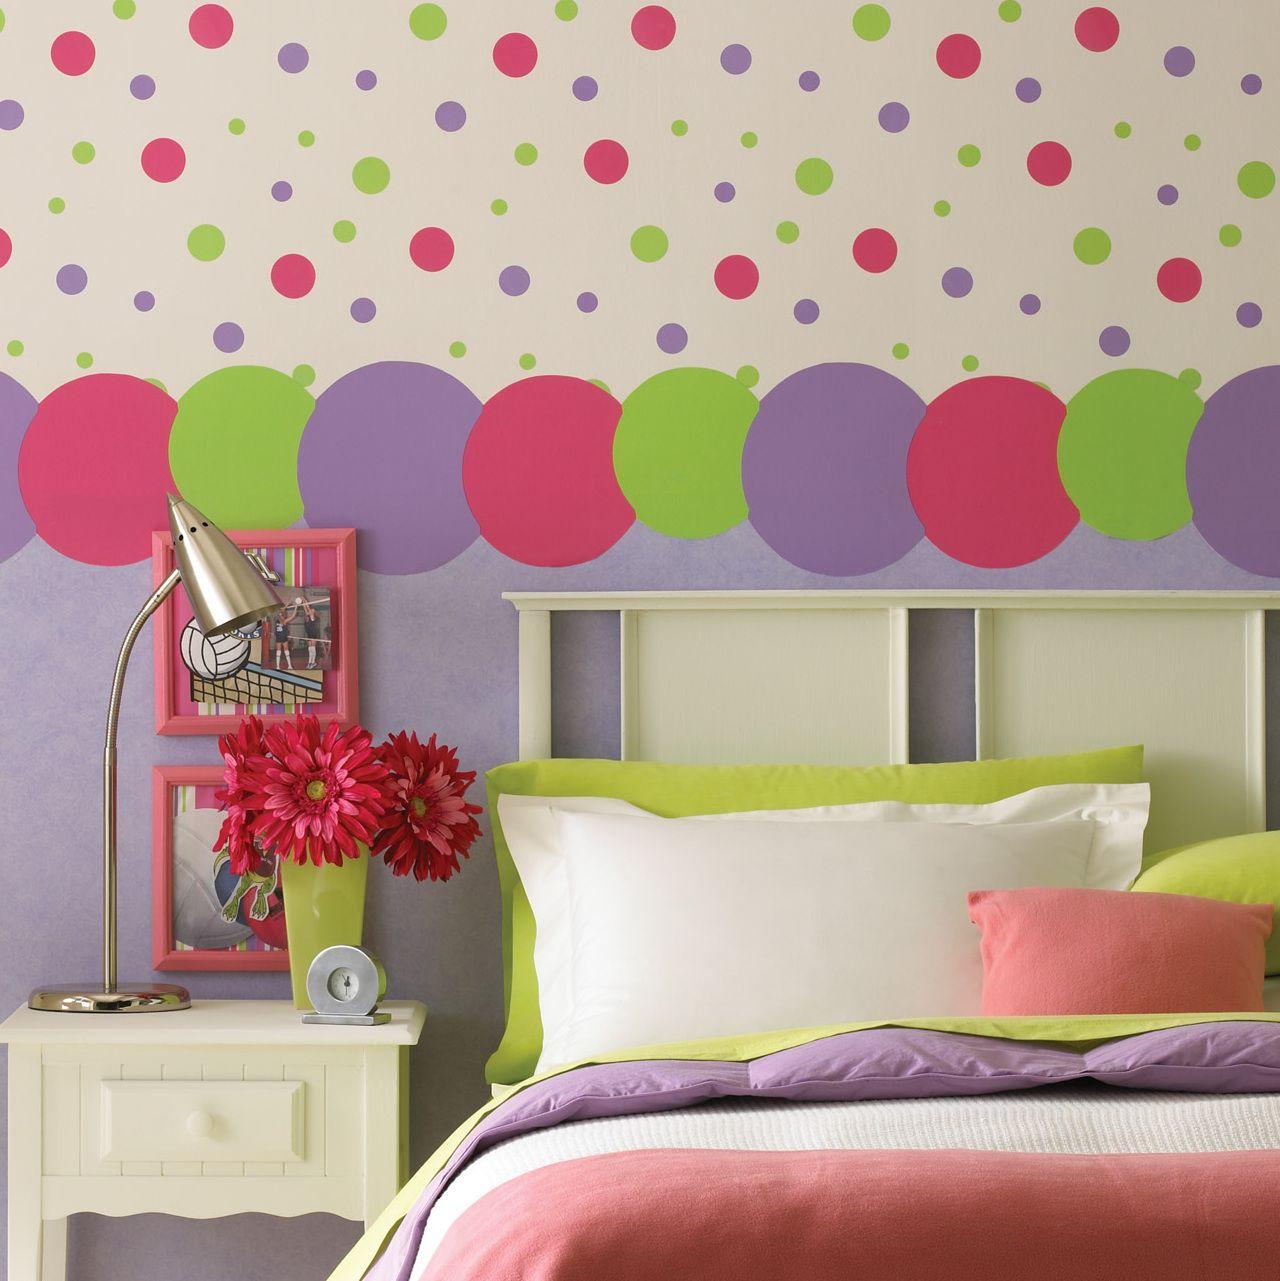 Brewster Home Fashions Kidding Around Polka Dot Wall